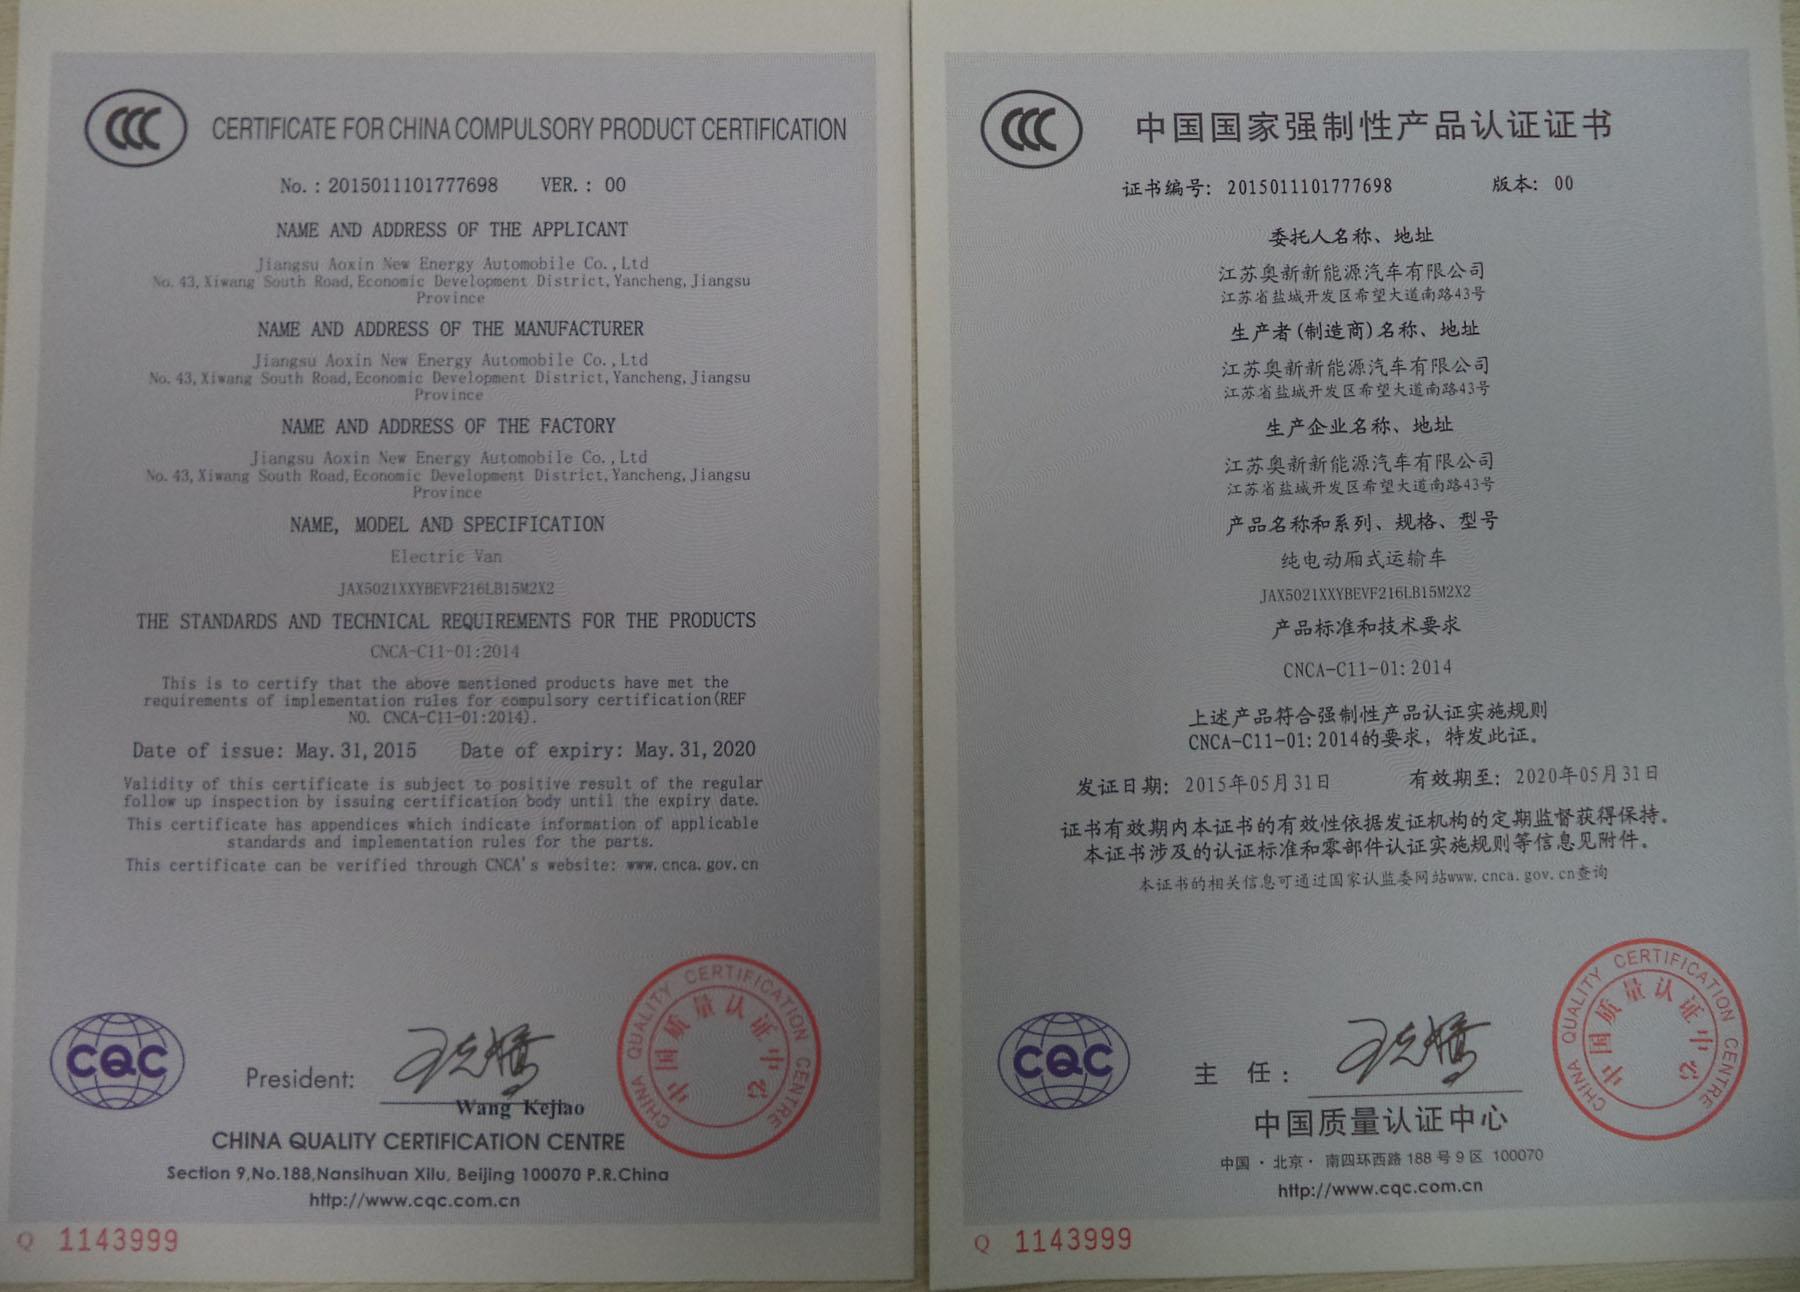 CCC certification box truck 02